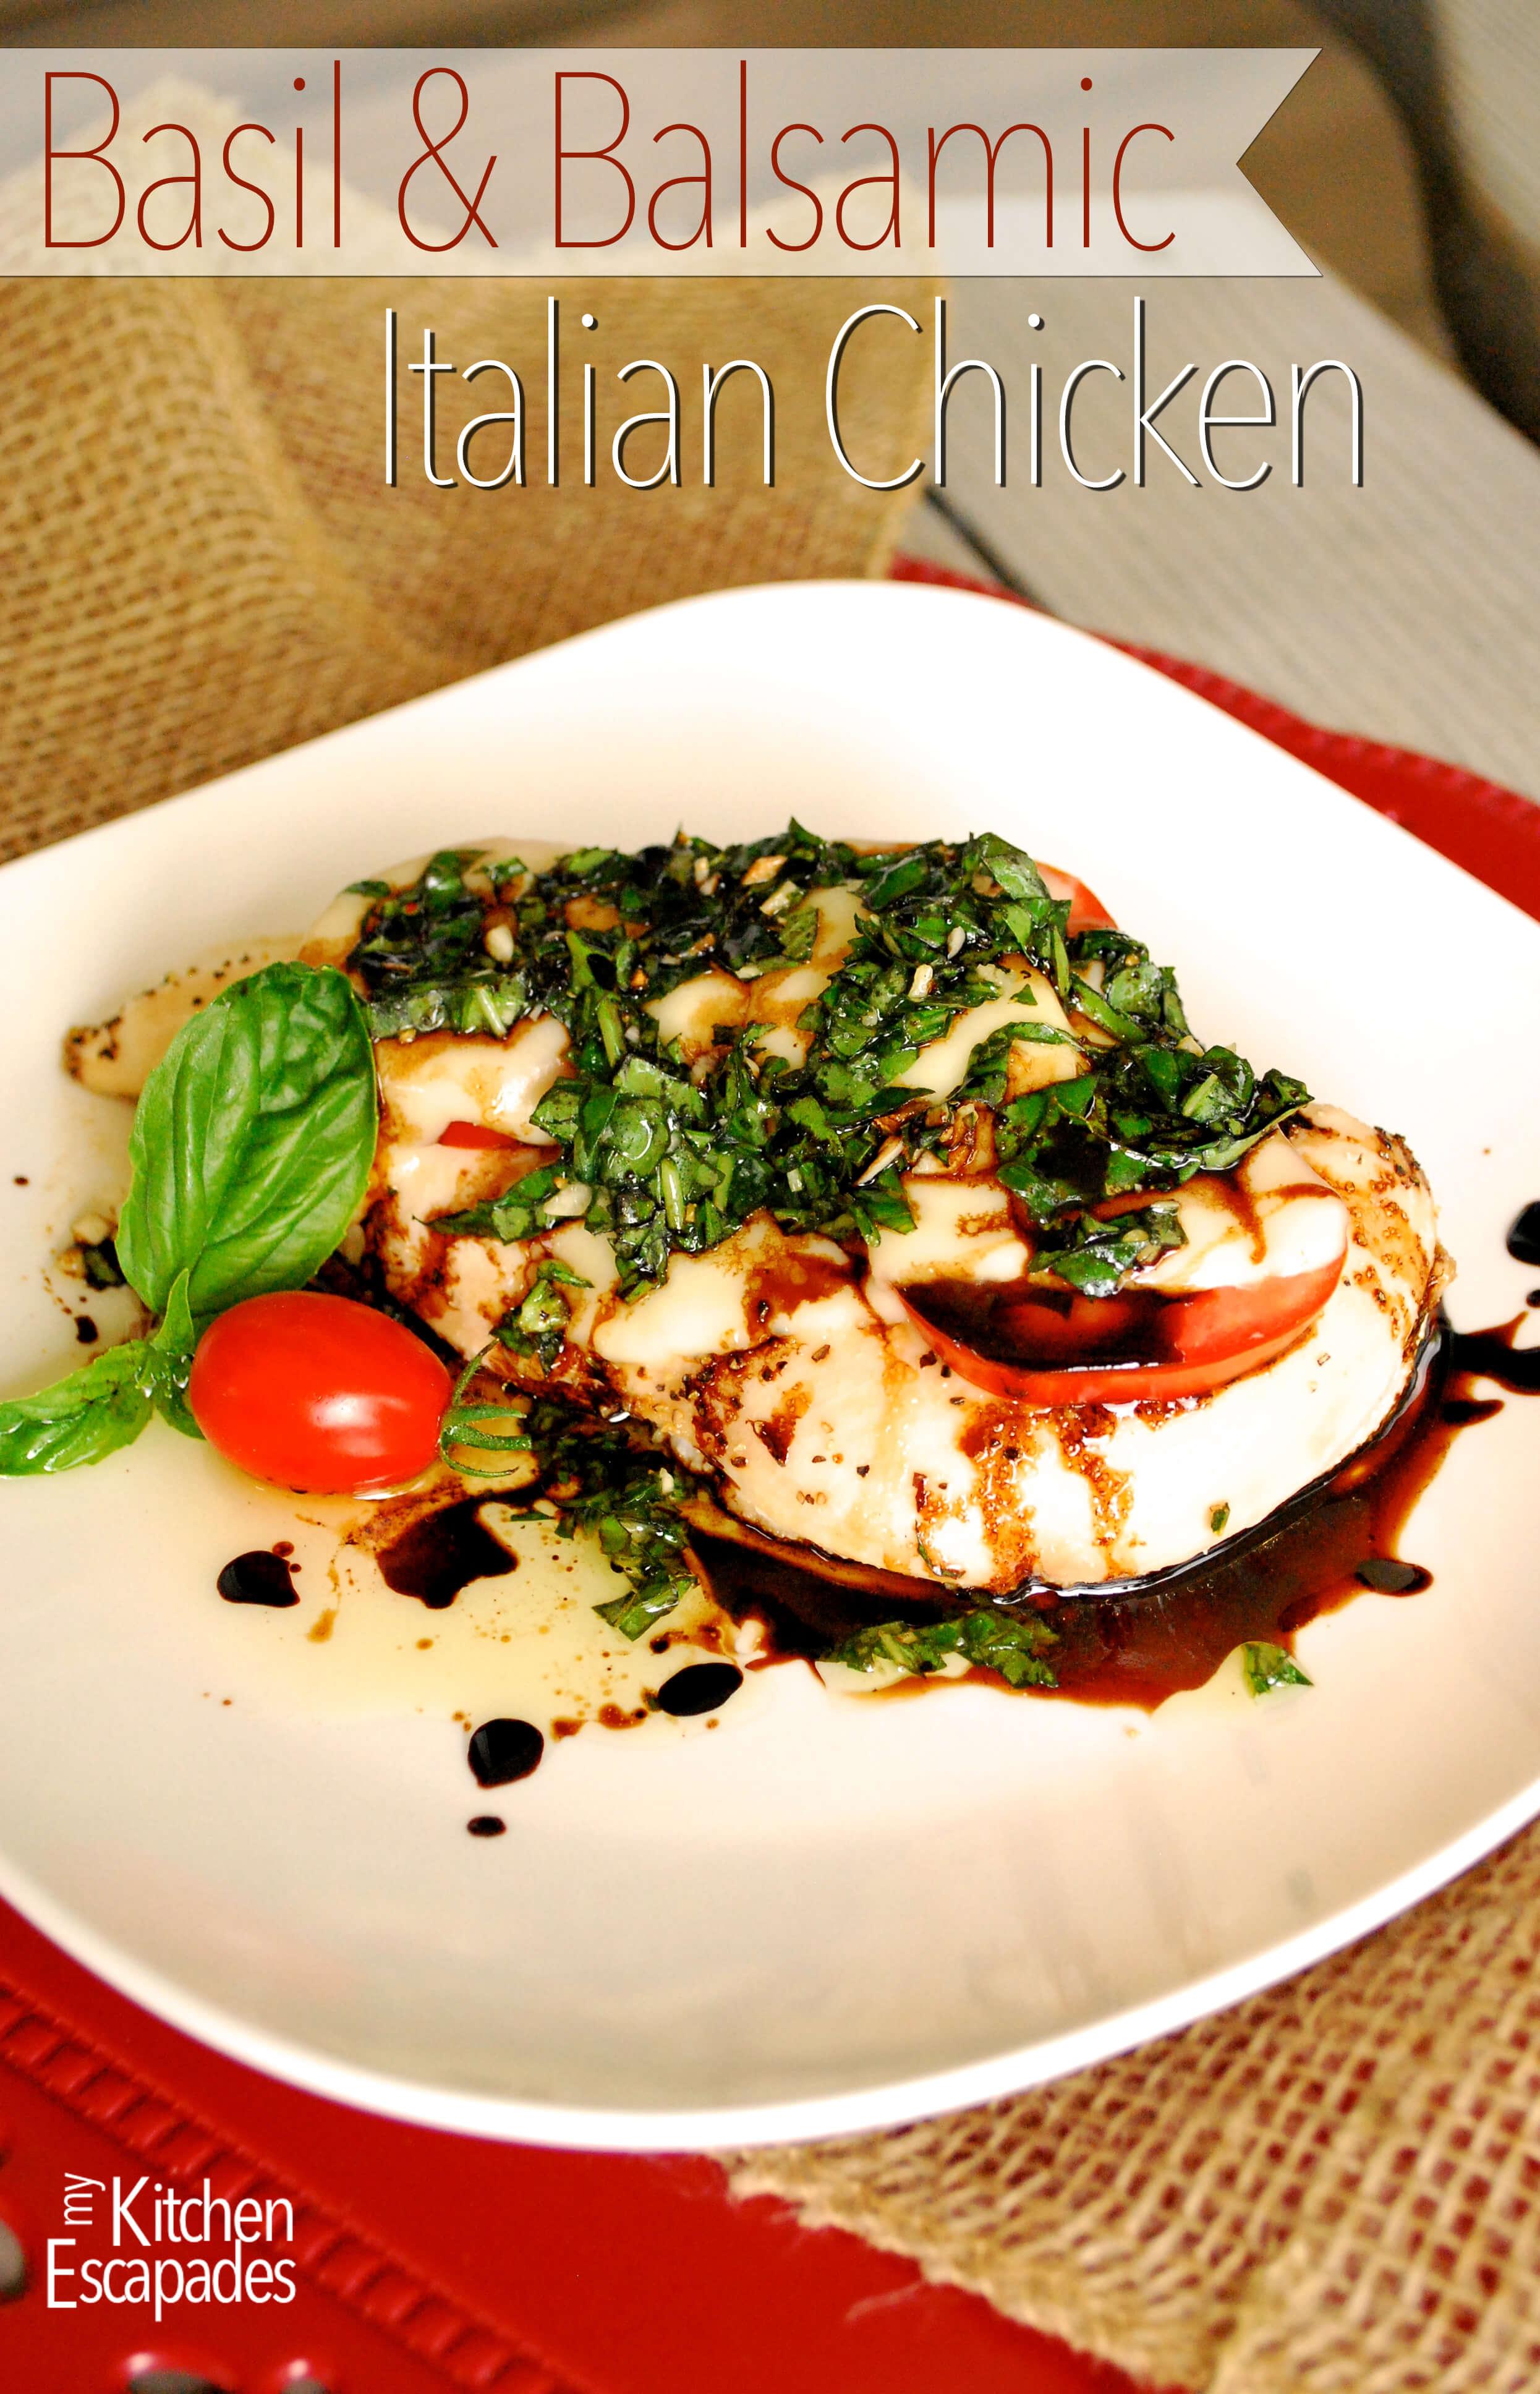 Basil and Balsamic Italian Chicken